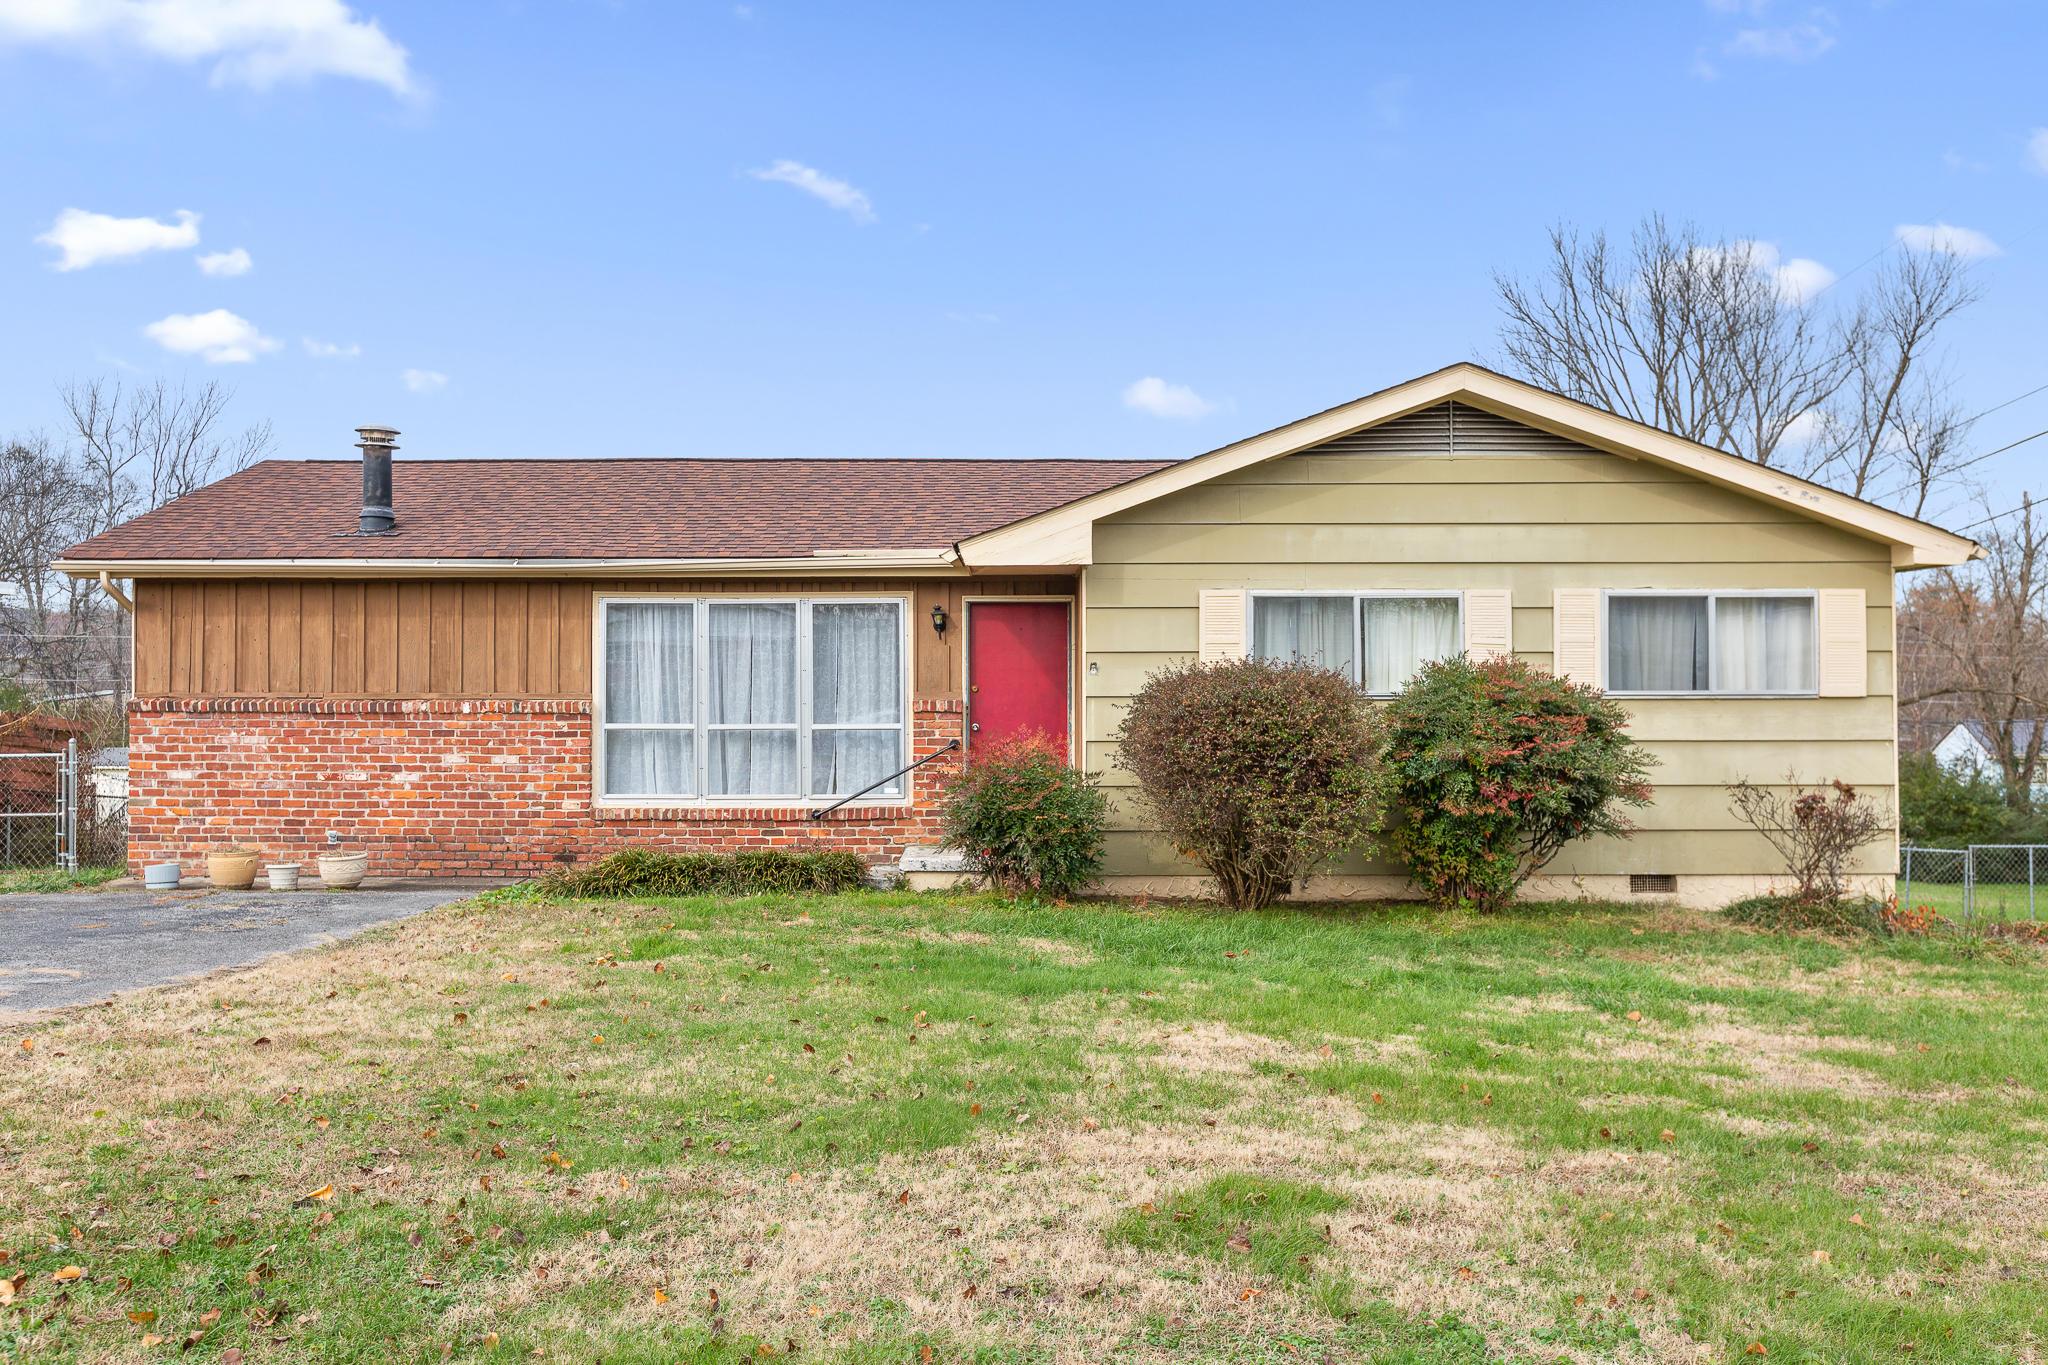 167 E Huntington Rd, Rossville, GA 30741